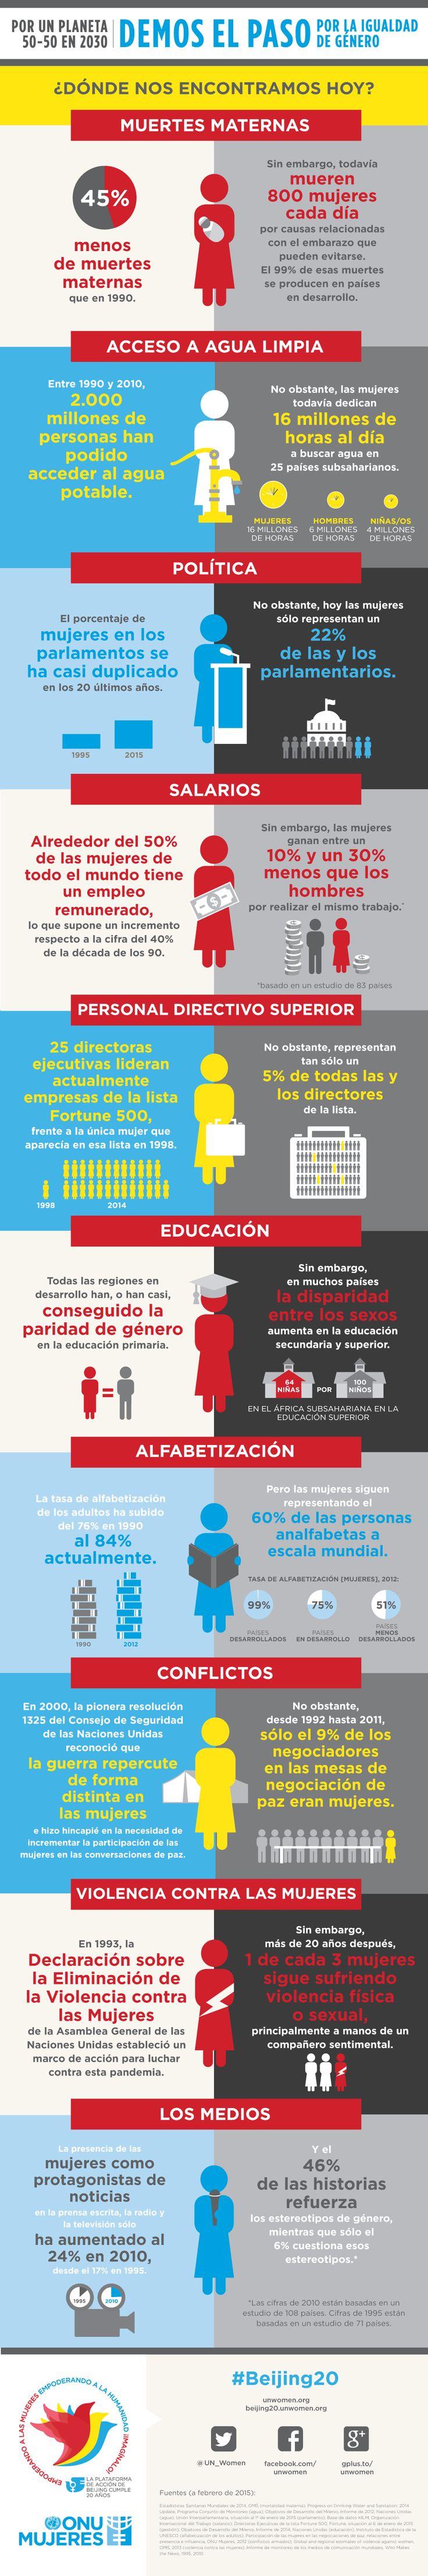 Objetivo 2030: Planeta 50-50 en Igualdad de género